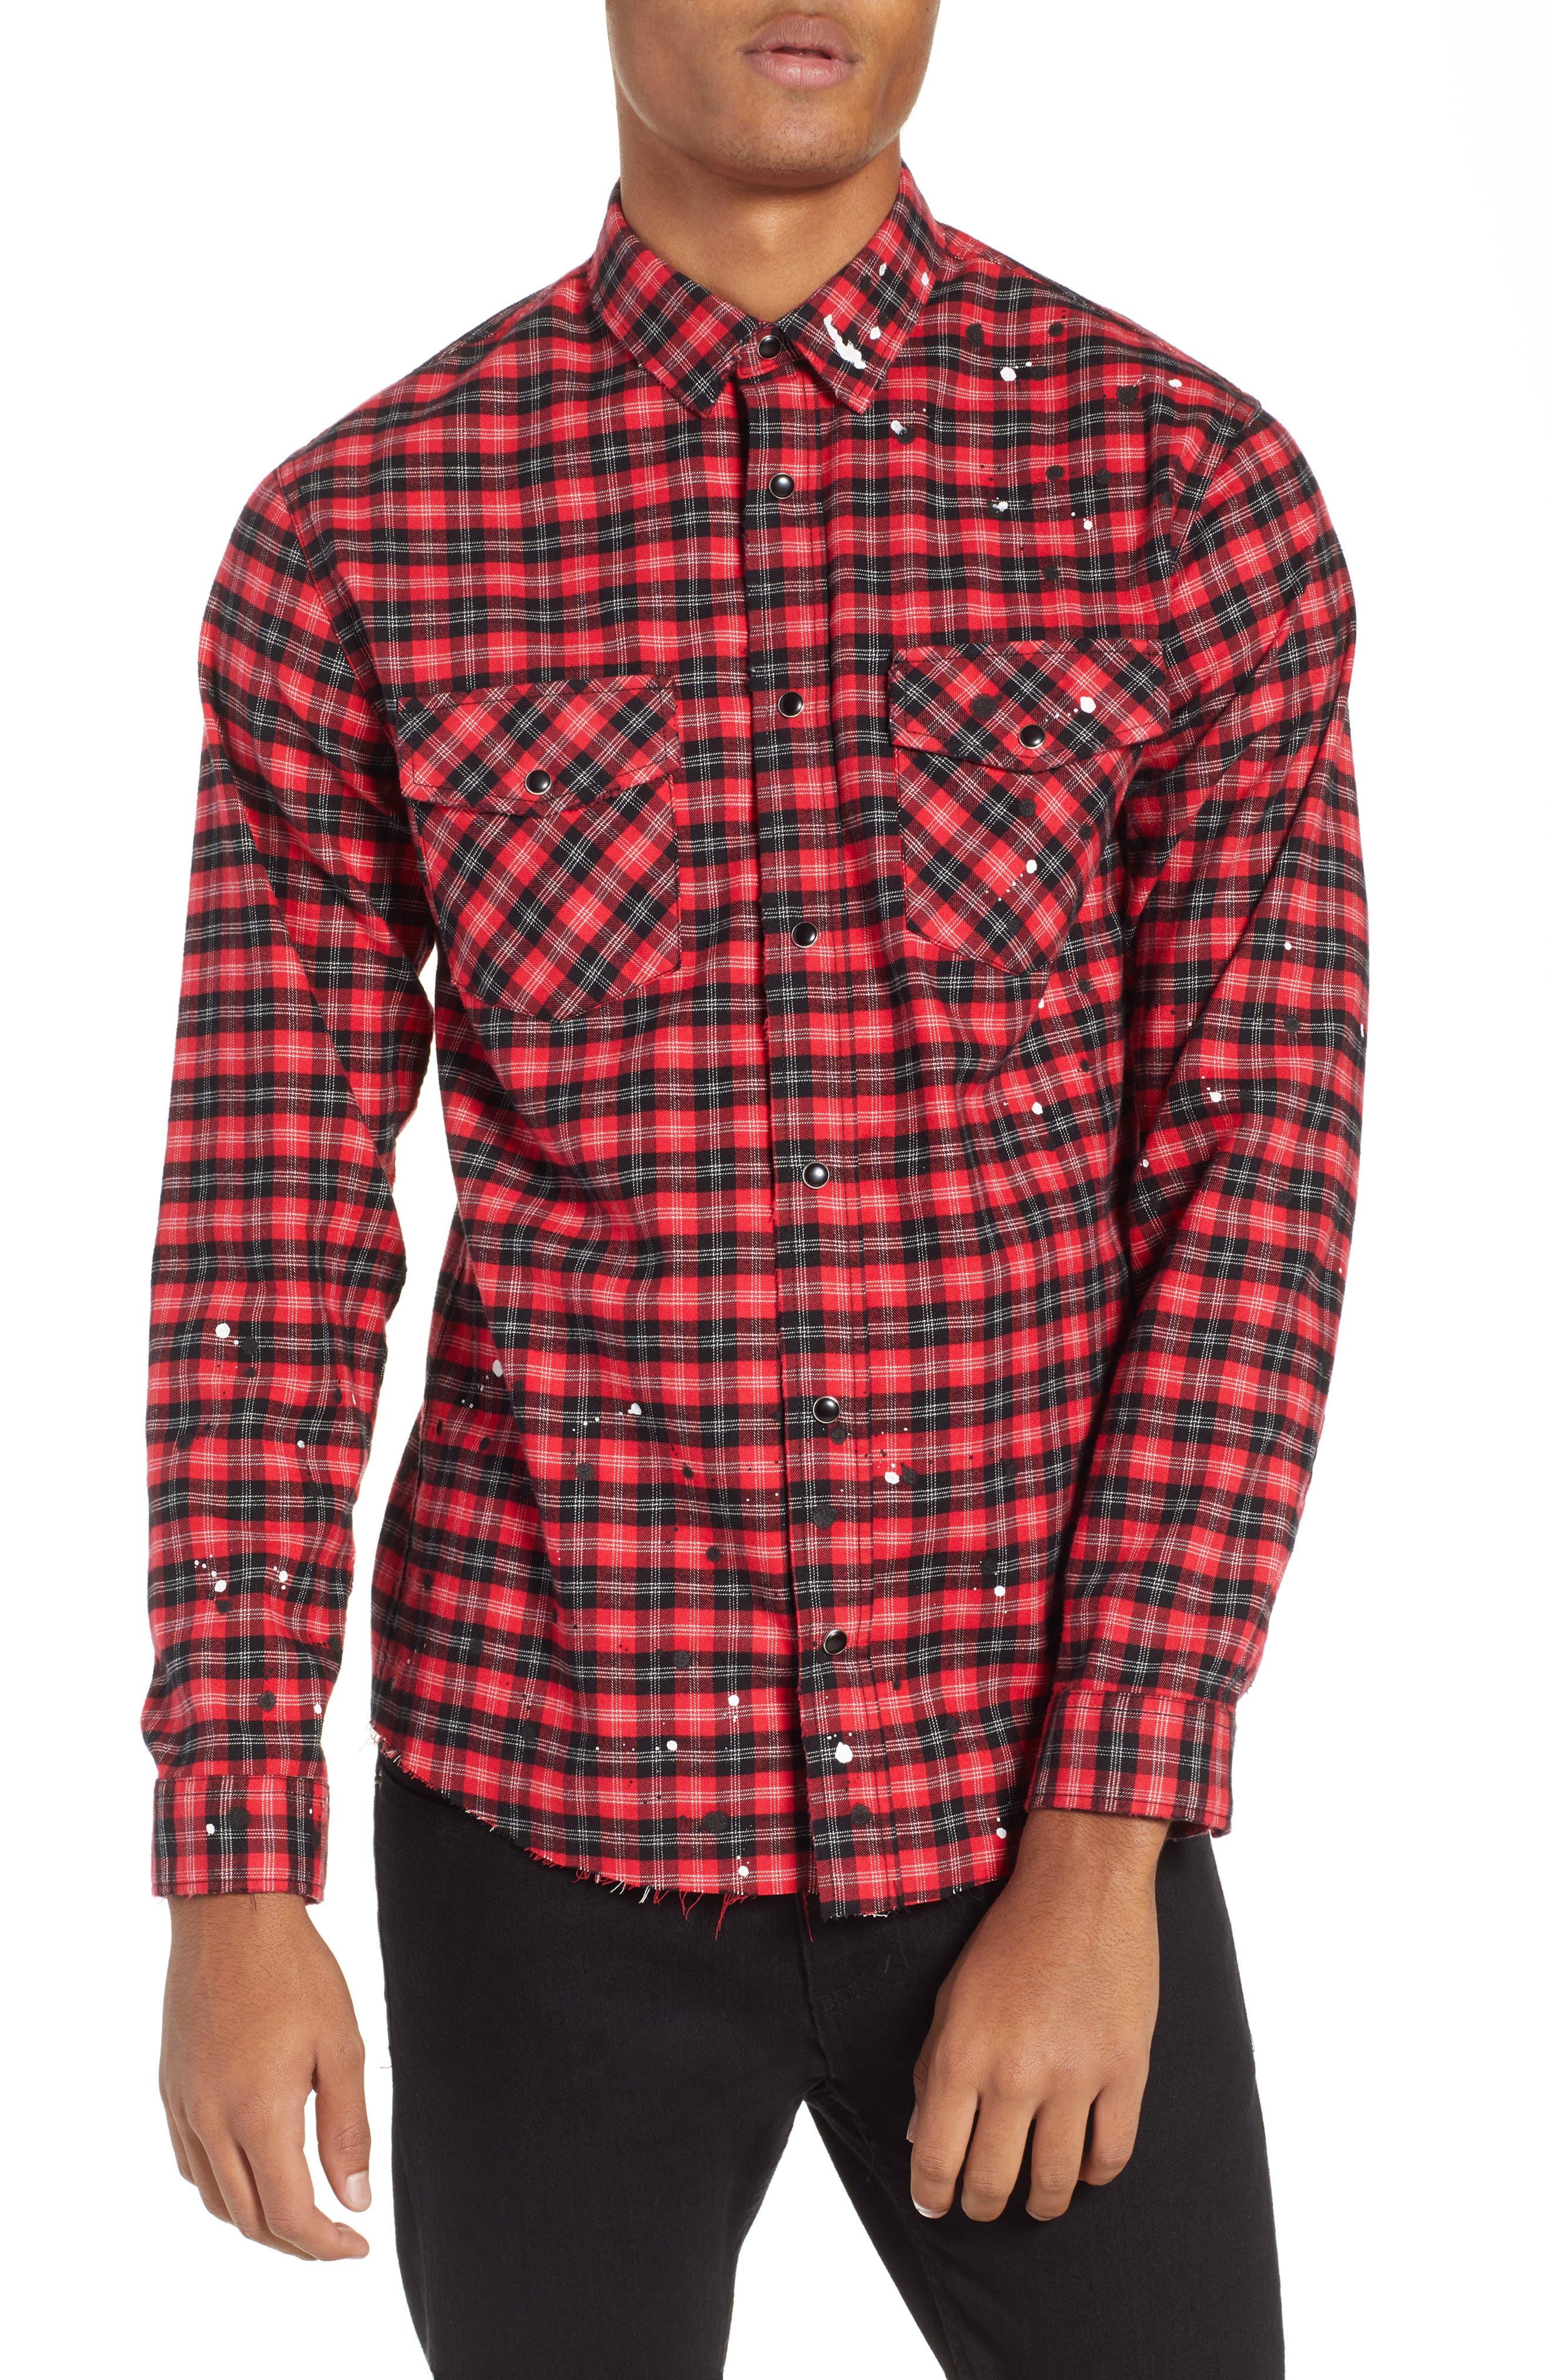 THE KOOPLES, Slim Fit Paint Spatter Flannel Shirt, Main thumbnail 1, color, 600